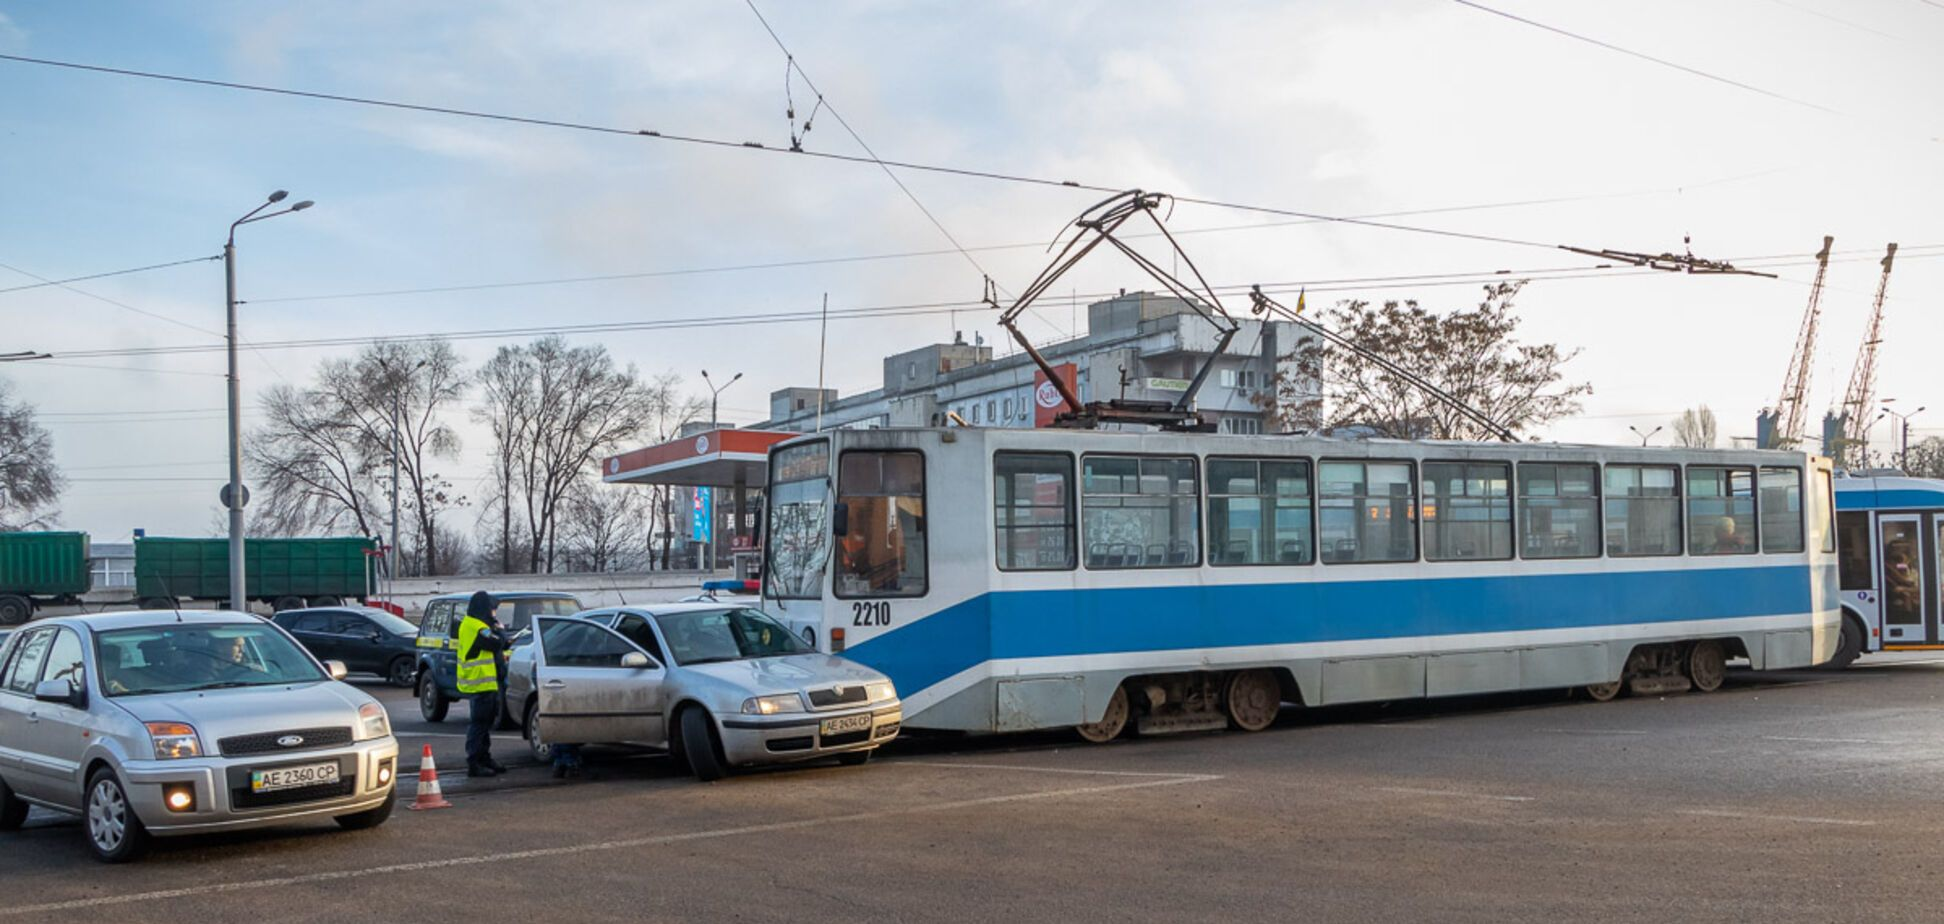 В Днепре трамвай на скорости протаранил легковушку. Фото и видео ДТП